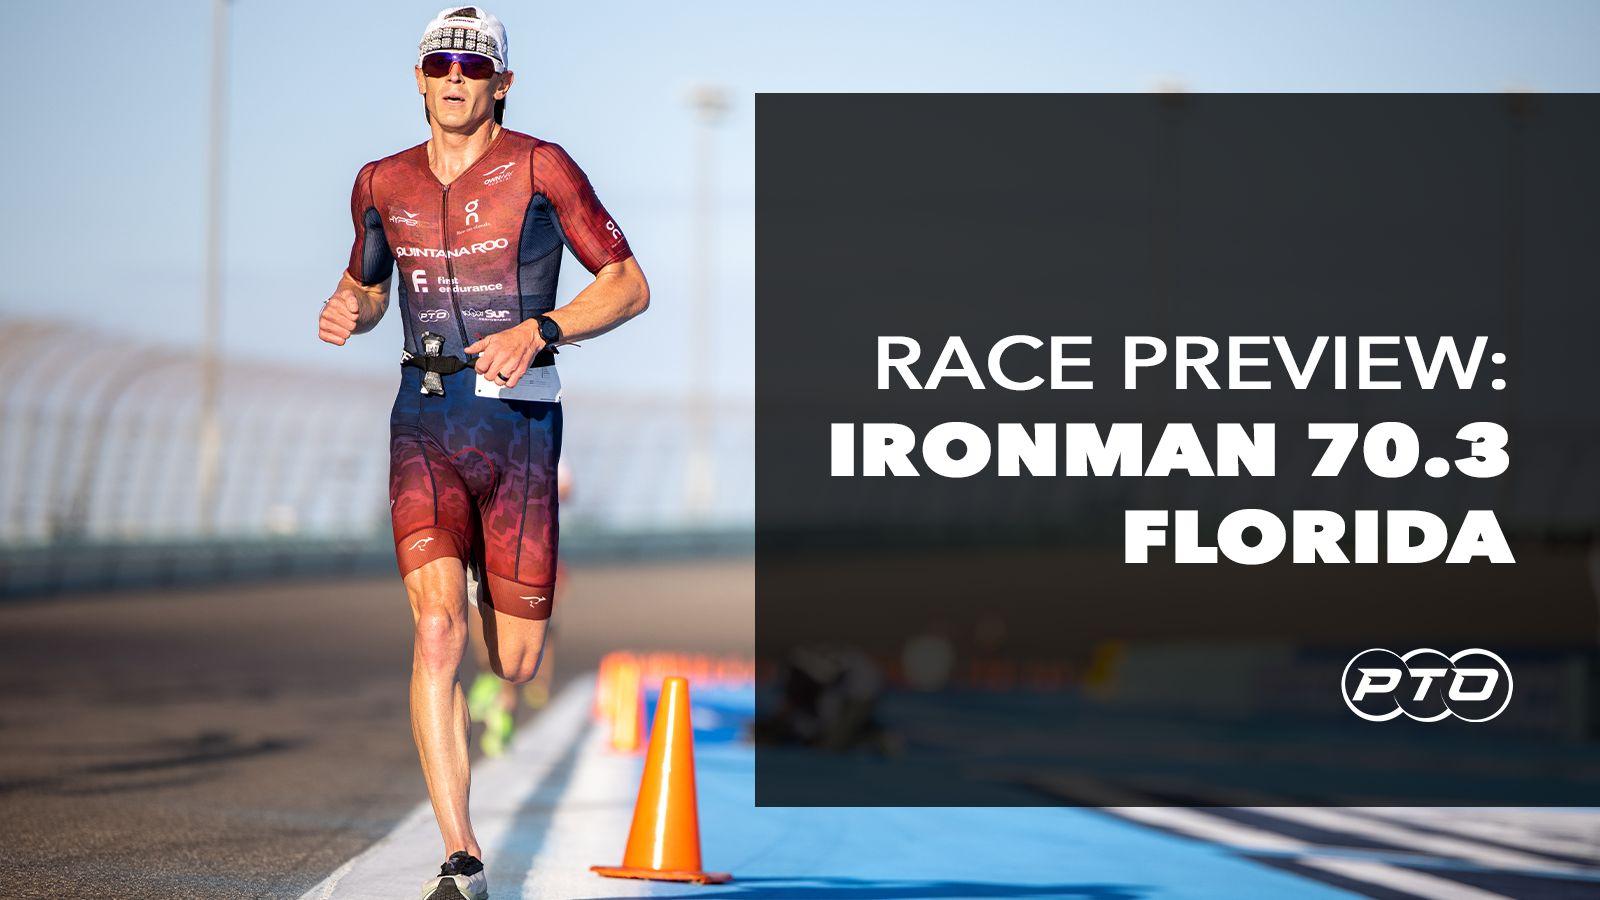 Race Preview: Ironman 70.3 Florida